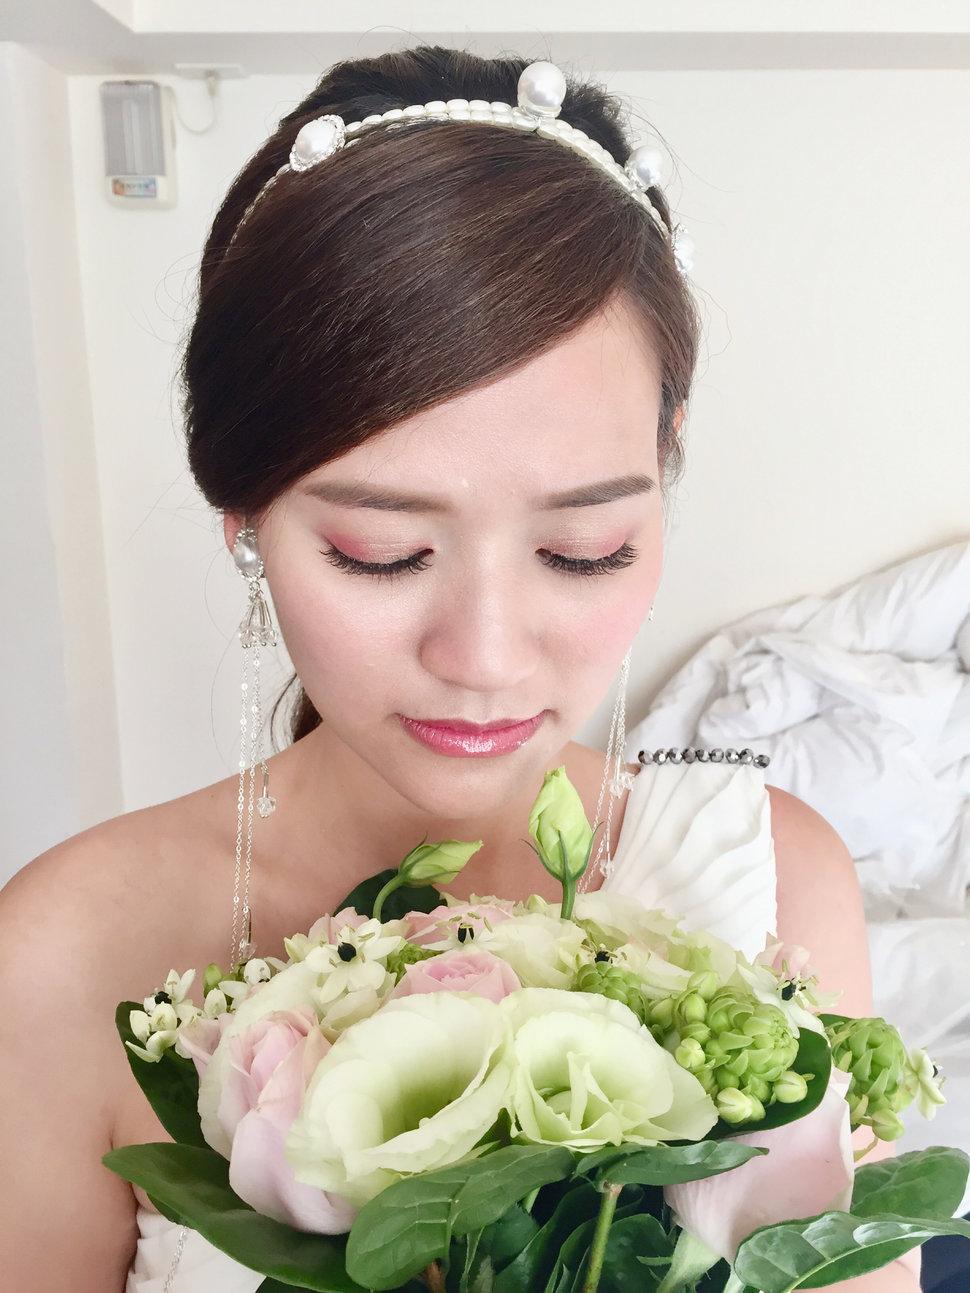 EBCF25C3-1691-46CB-85CB-924AE451749D - 新娘祕書心儷 - 結婚吧